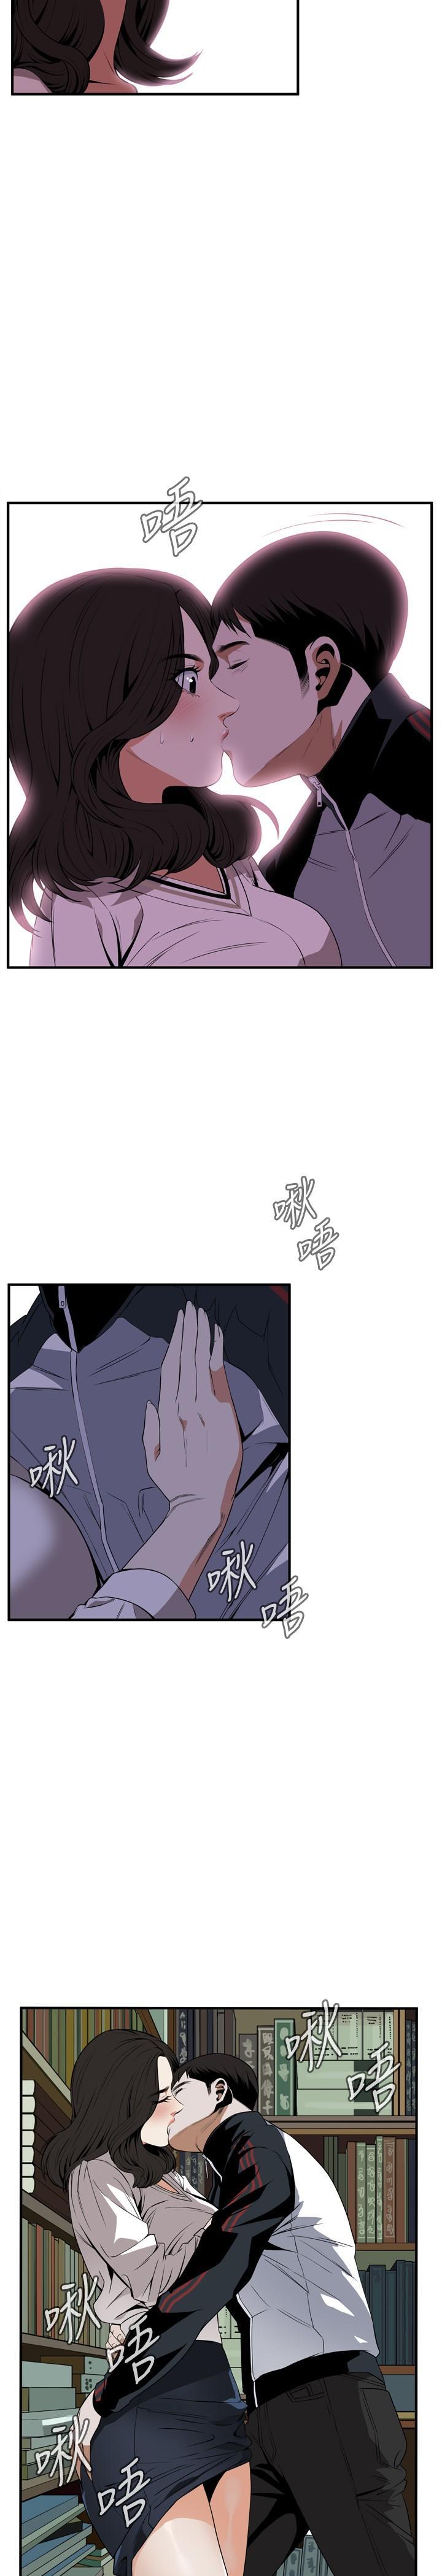 Take a Peek 偷窥 Ch.39~55 [Chinese]中文 43